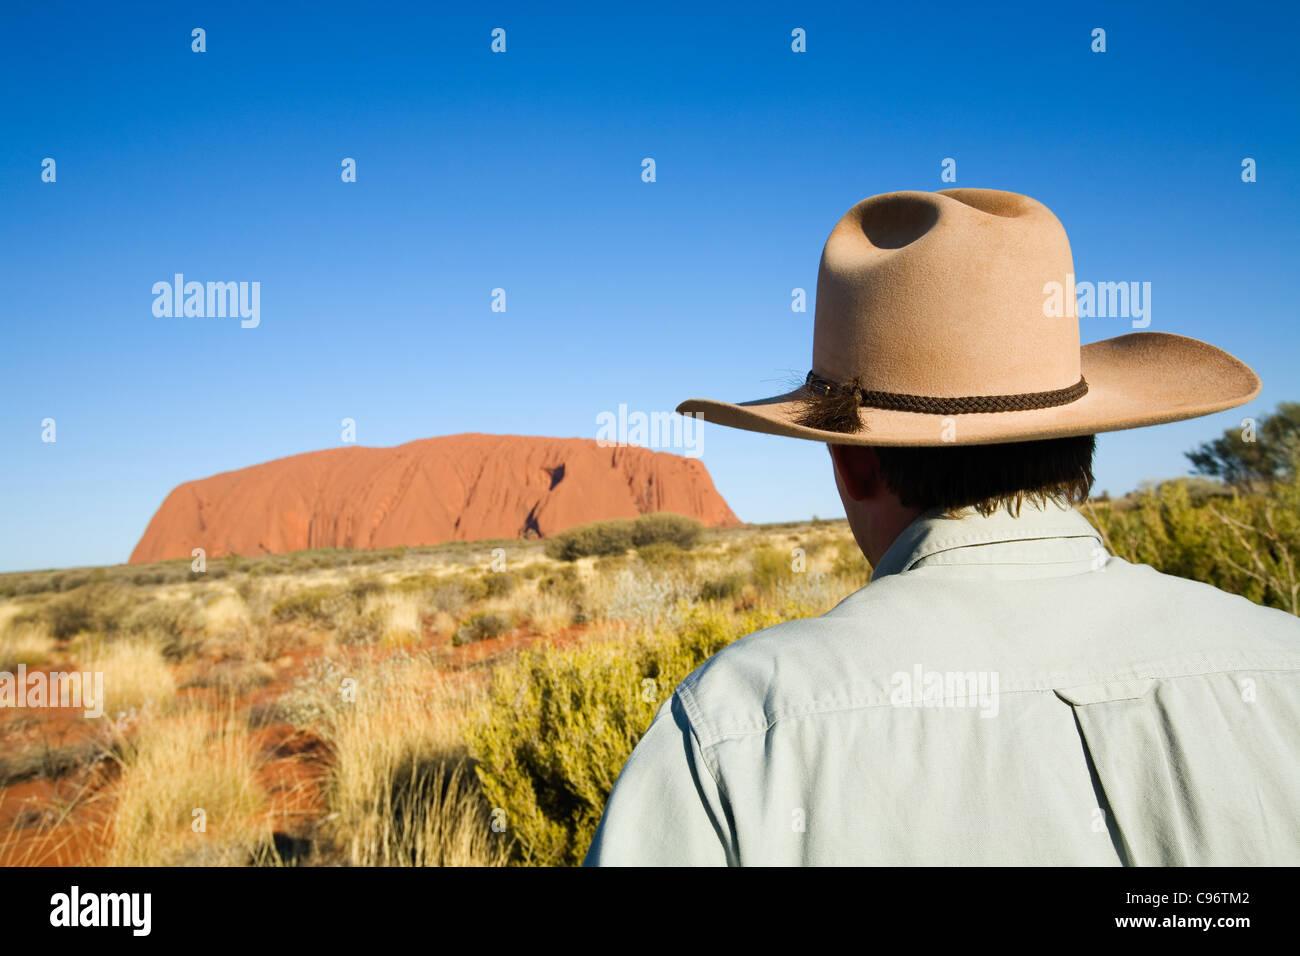 Ein Outback-Guide zum Uluru (Ayers Rock).  Uluru-Kata Tjuta National Park, Northern Territory, Australien Stockbild